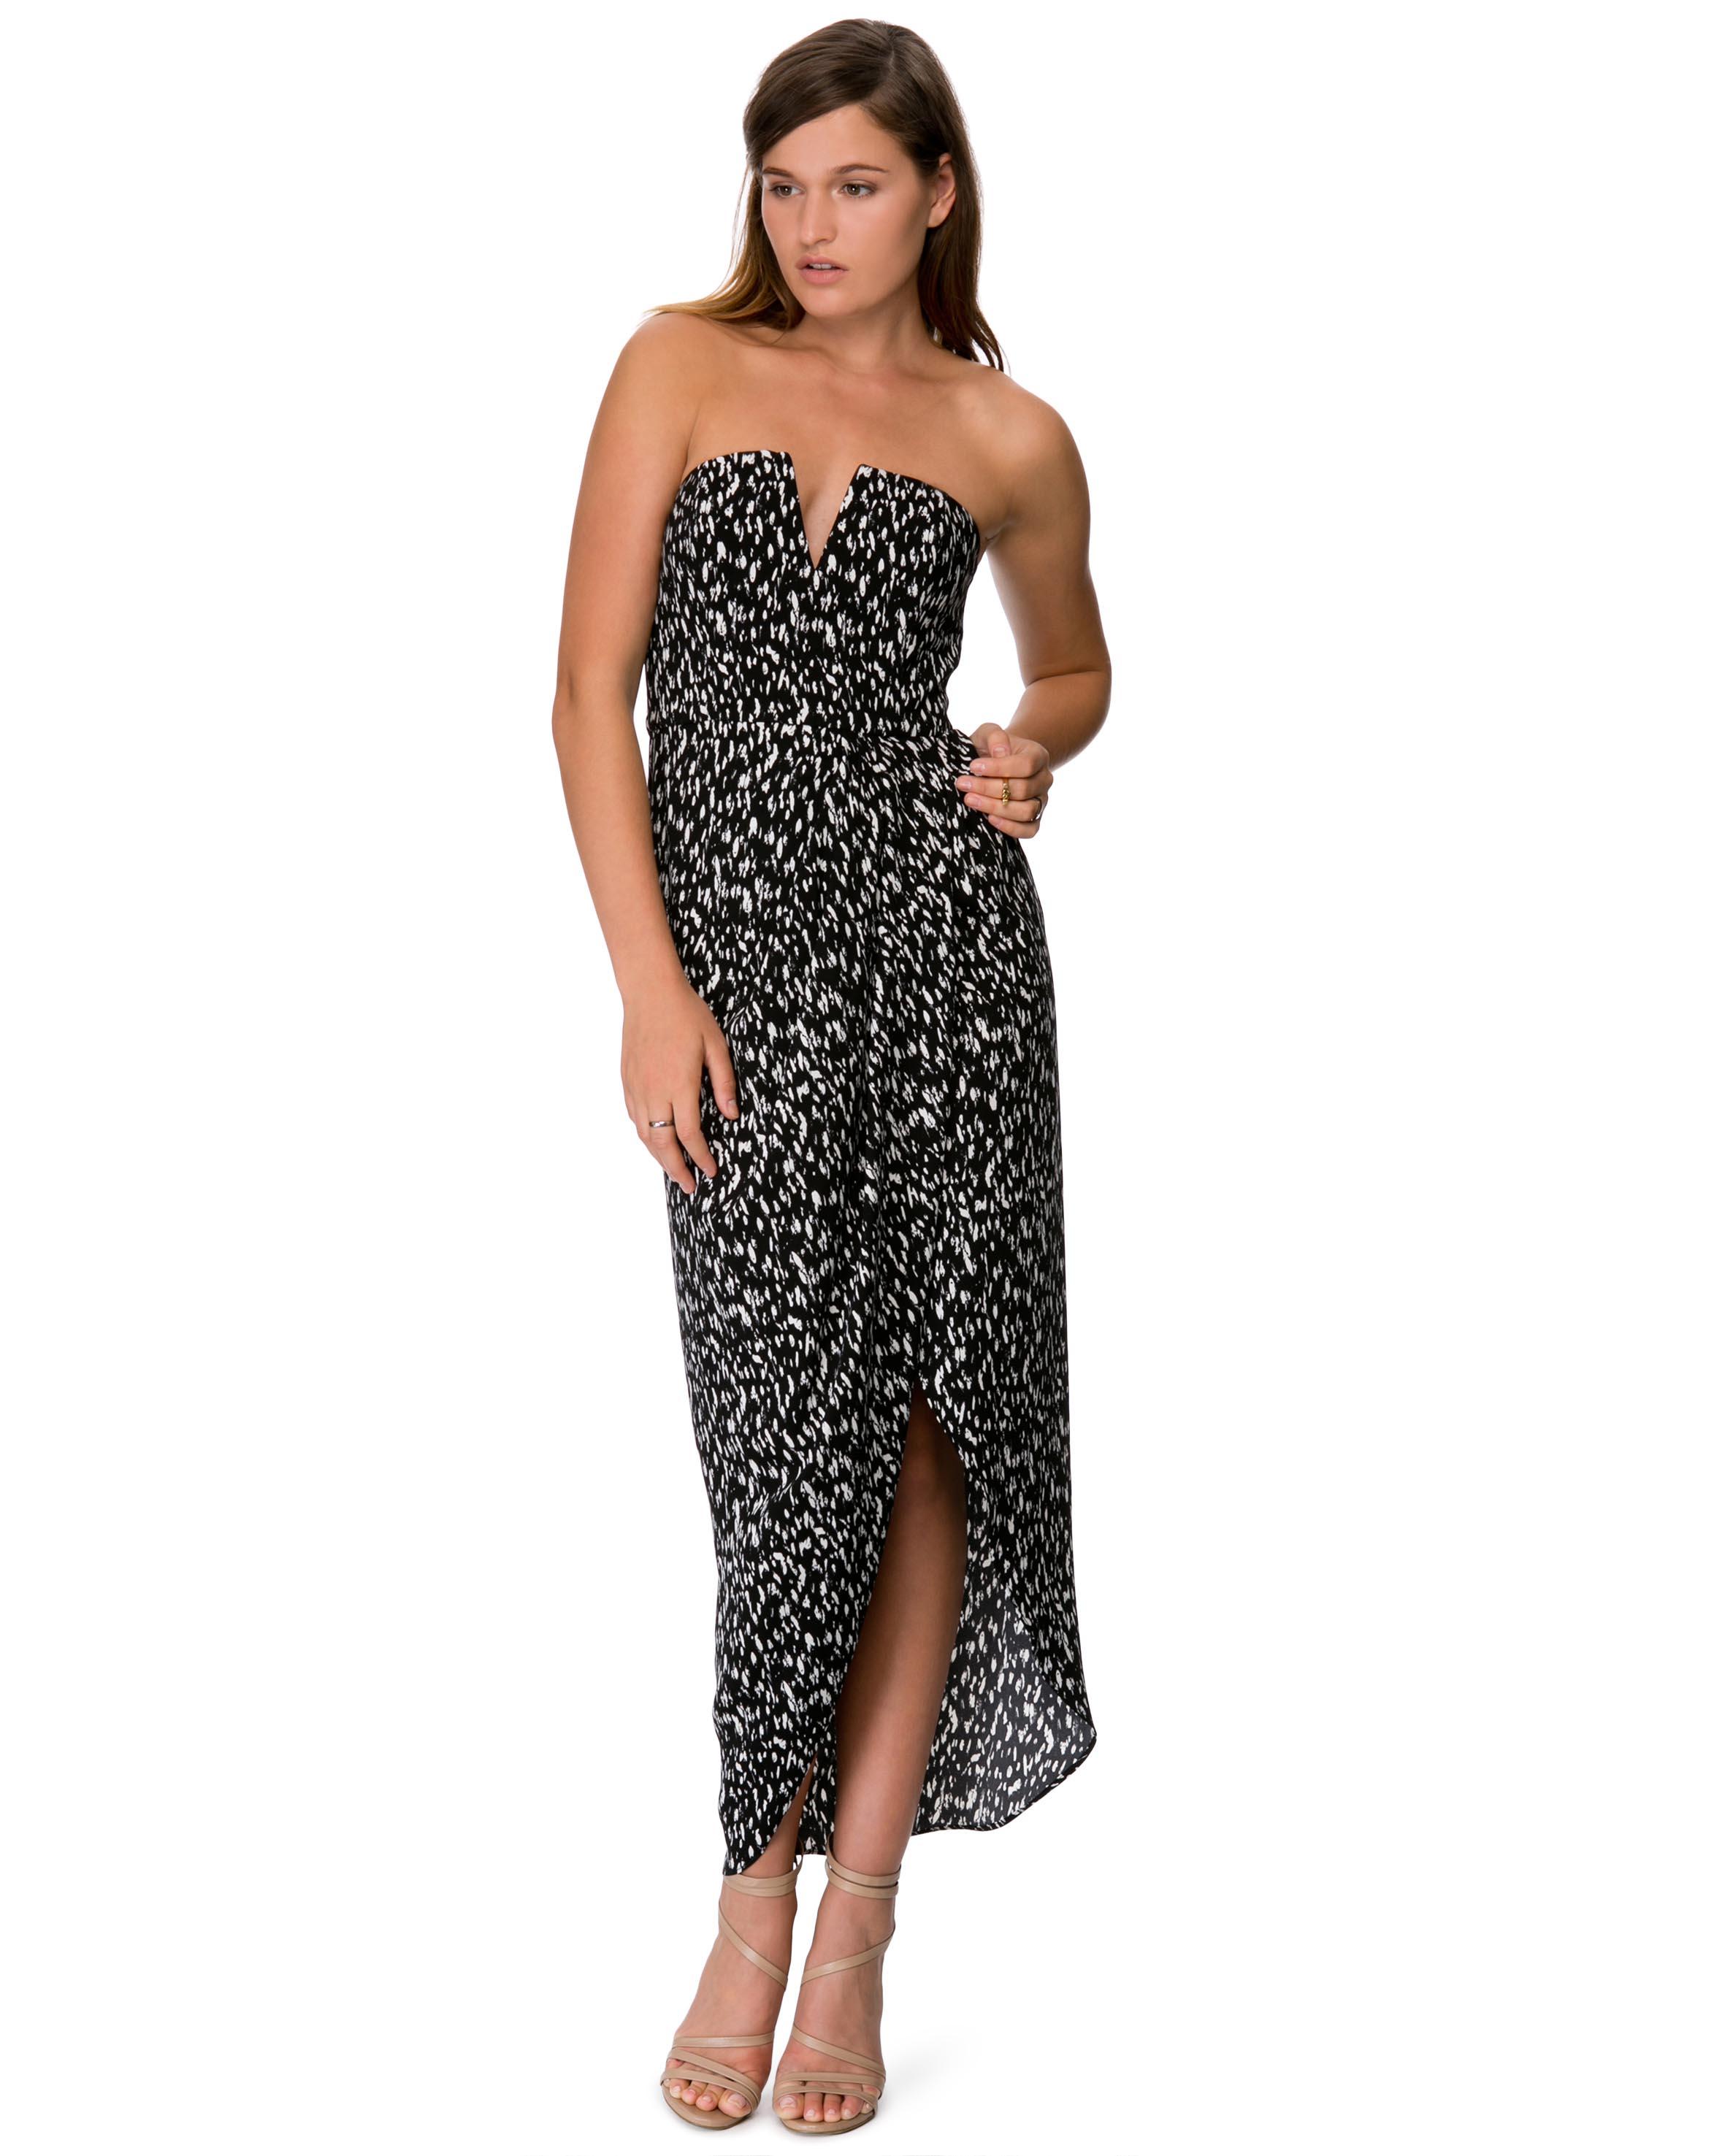 VA 2015 Summer Big Plus Size XXXL Women Dress Long Maxi Yellow Floral Print Chiffon Dresses Cheap Clothing Shop Online P00076